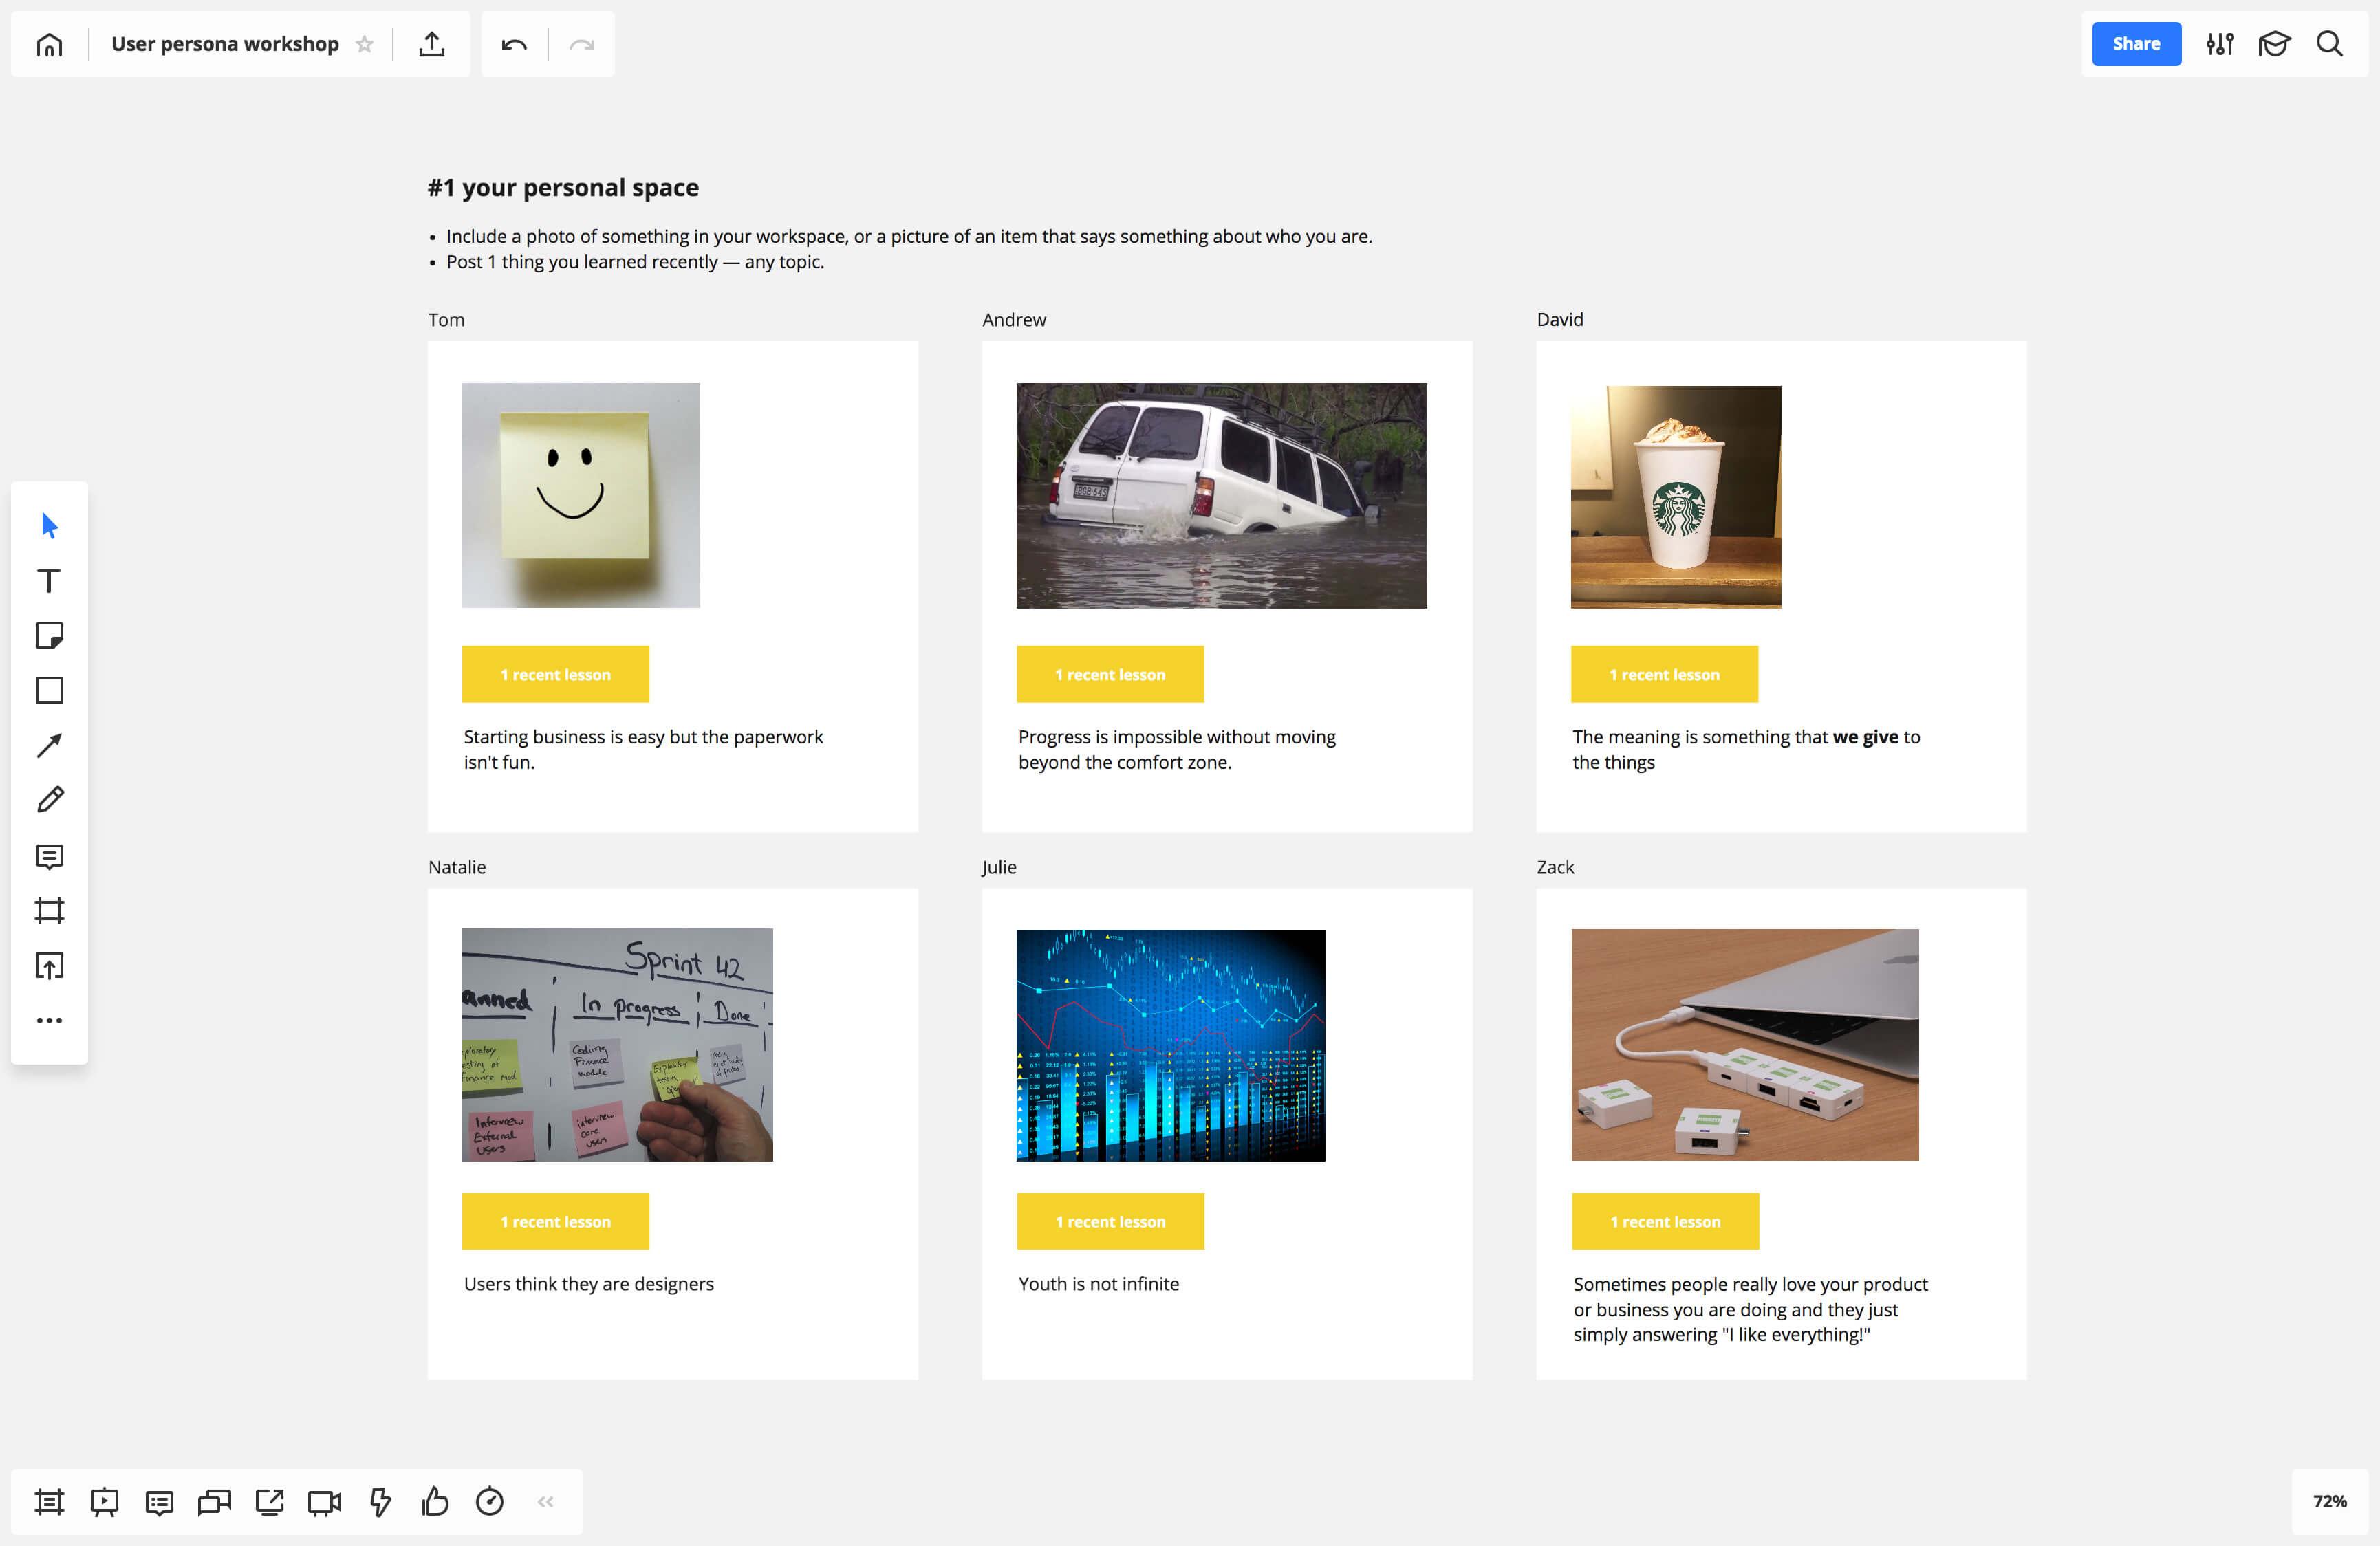 Remote team building activities - persona workshop